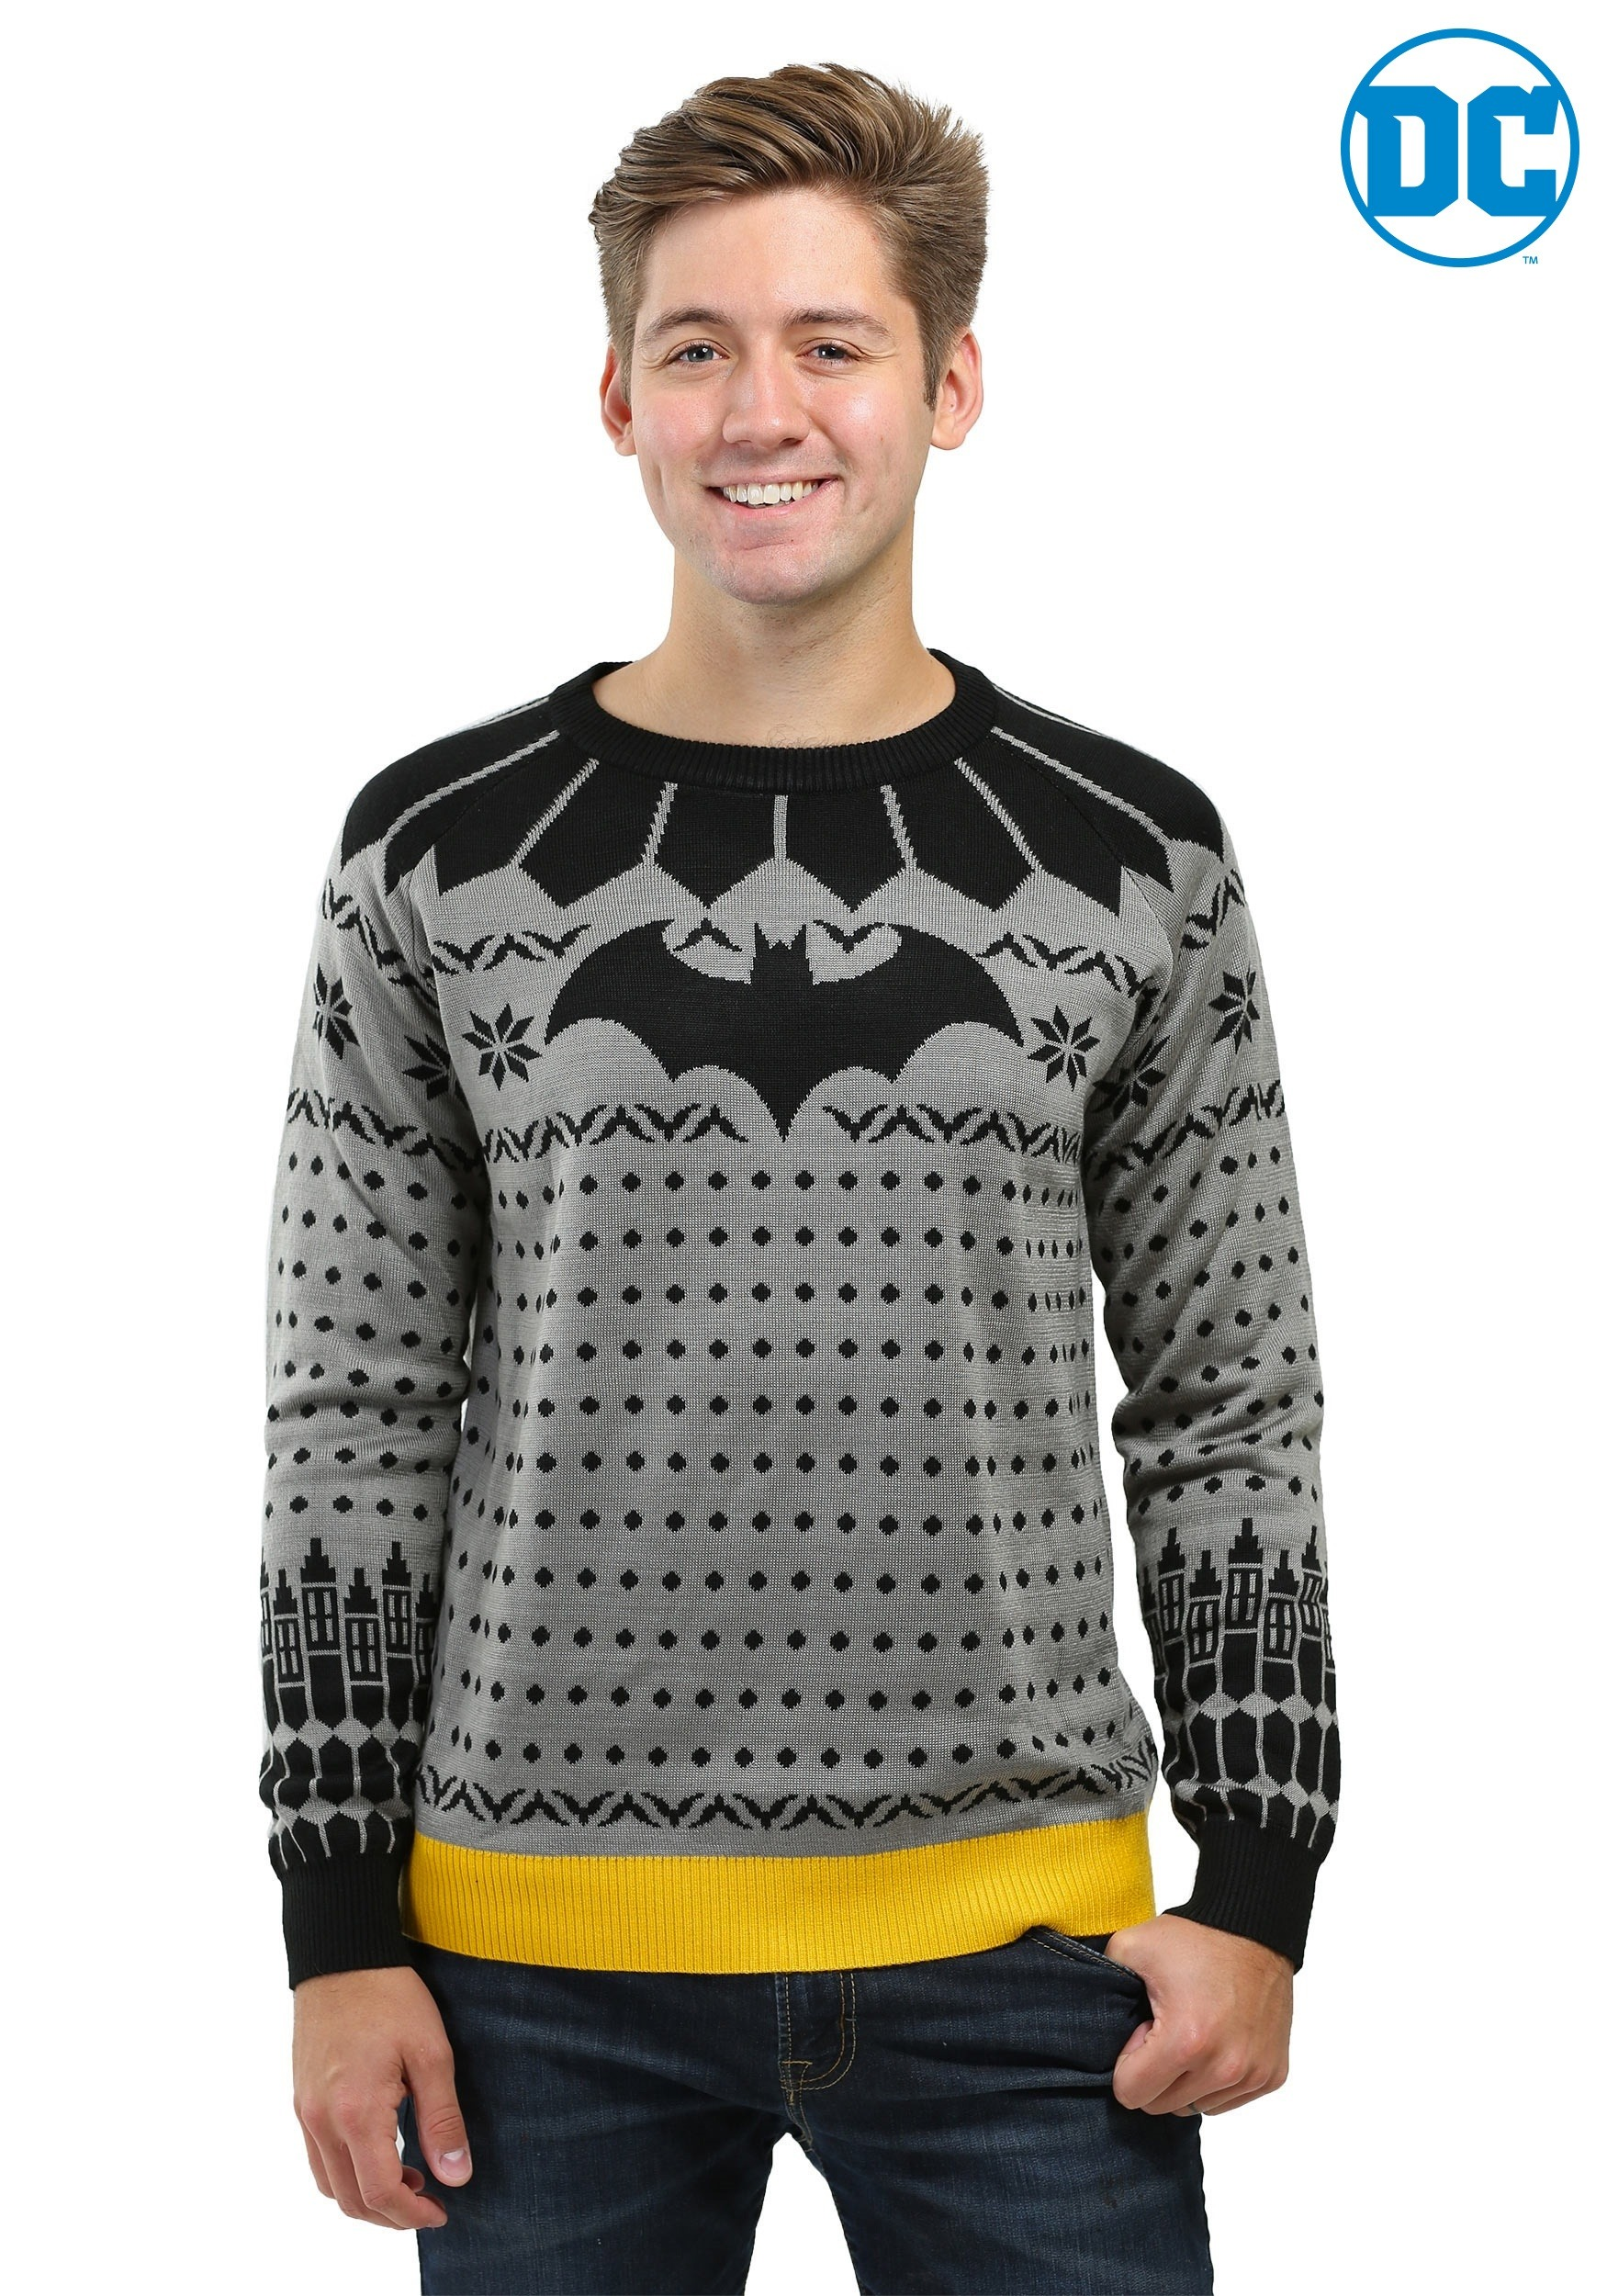 3x Ugly Christmas Sweater.Classic Batman Ugly Christmas Sweater